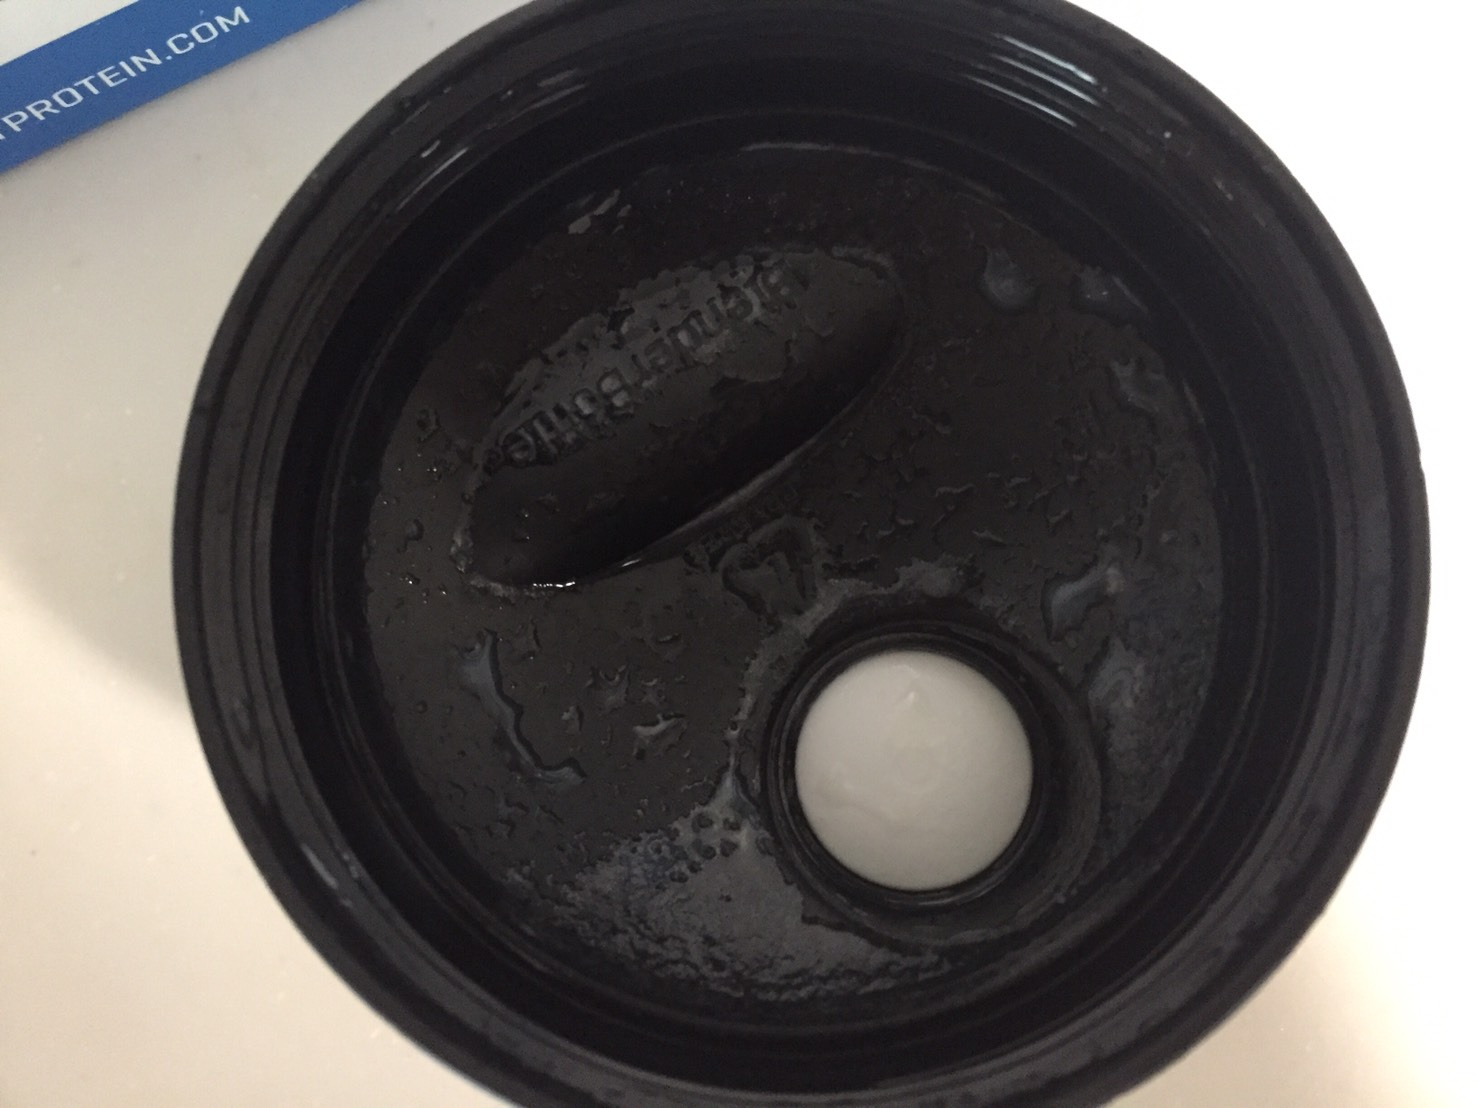 【WPC】Impactホエイプロテイン「Natural Vanilla(ナチュラルバニラ味)」を飲み終えた様子。蓋側